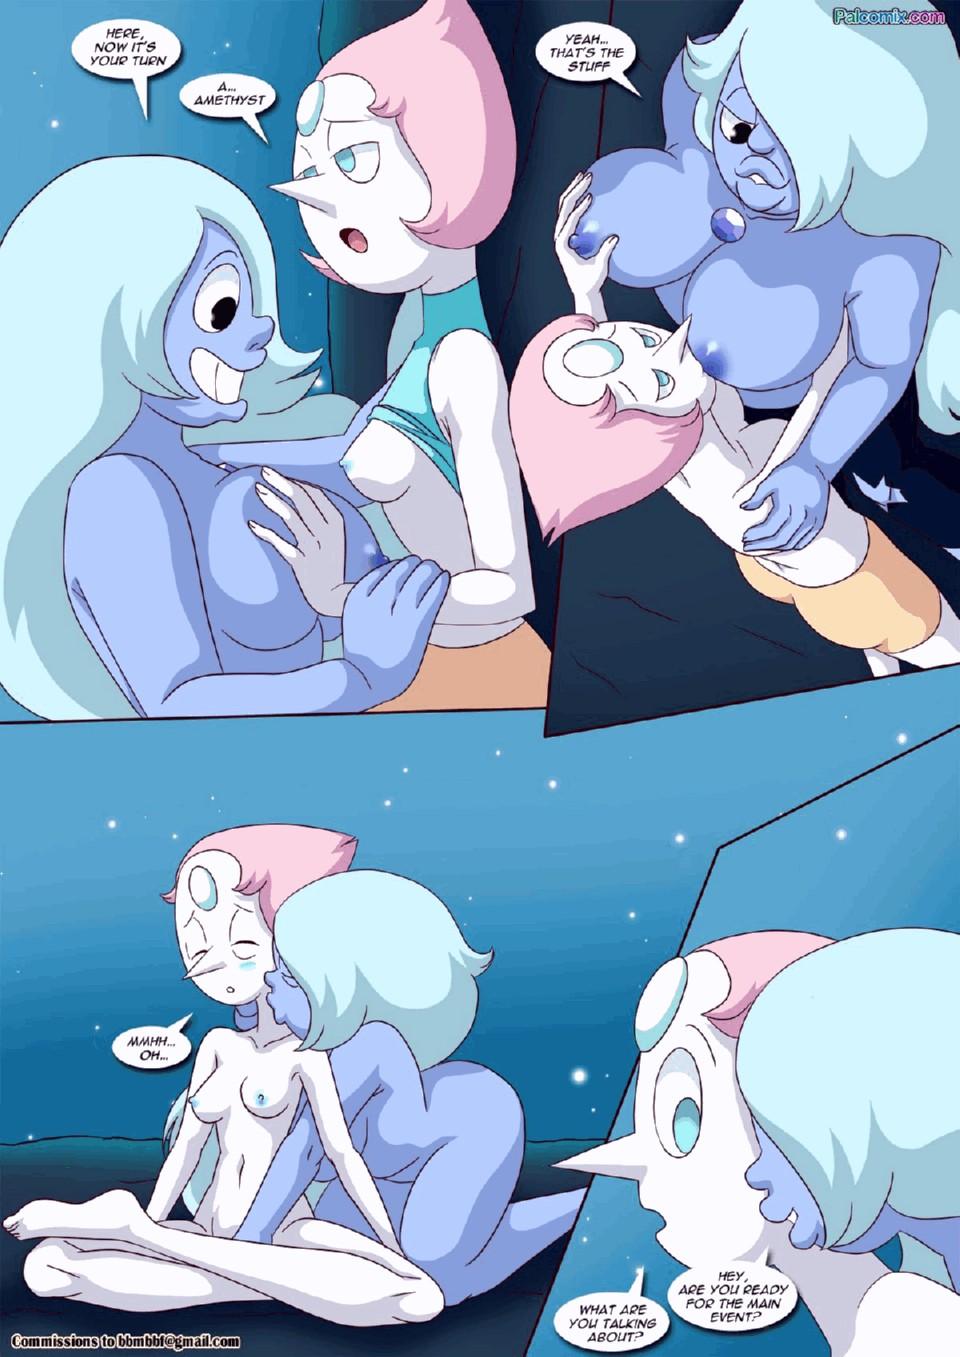 Rose's memories porn comic page 013